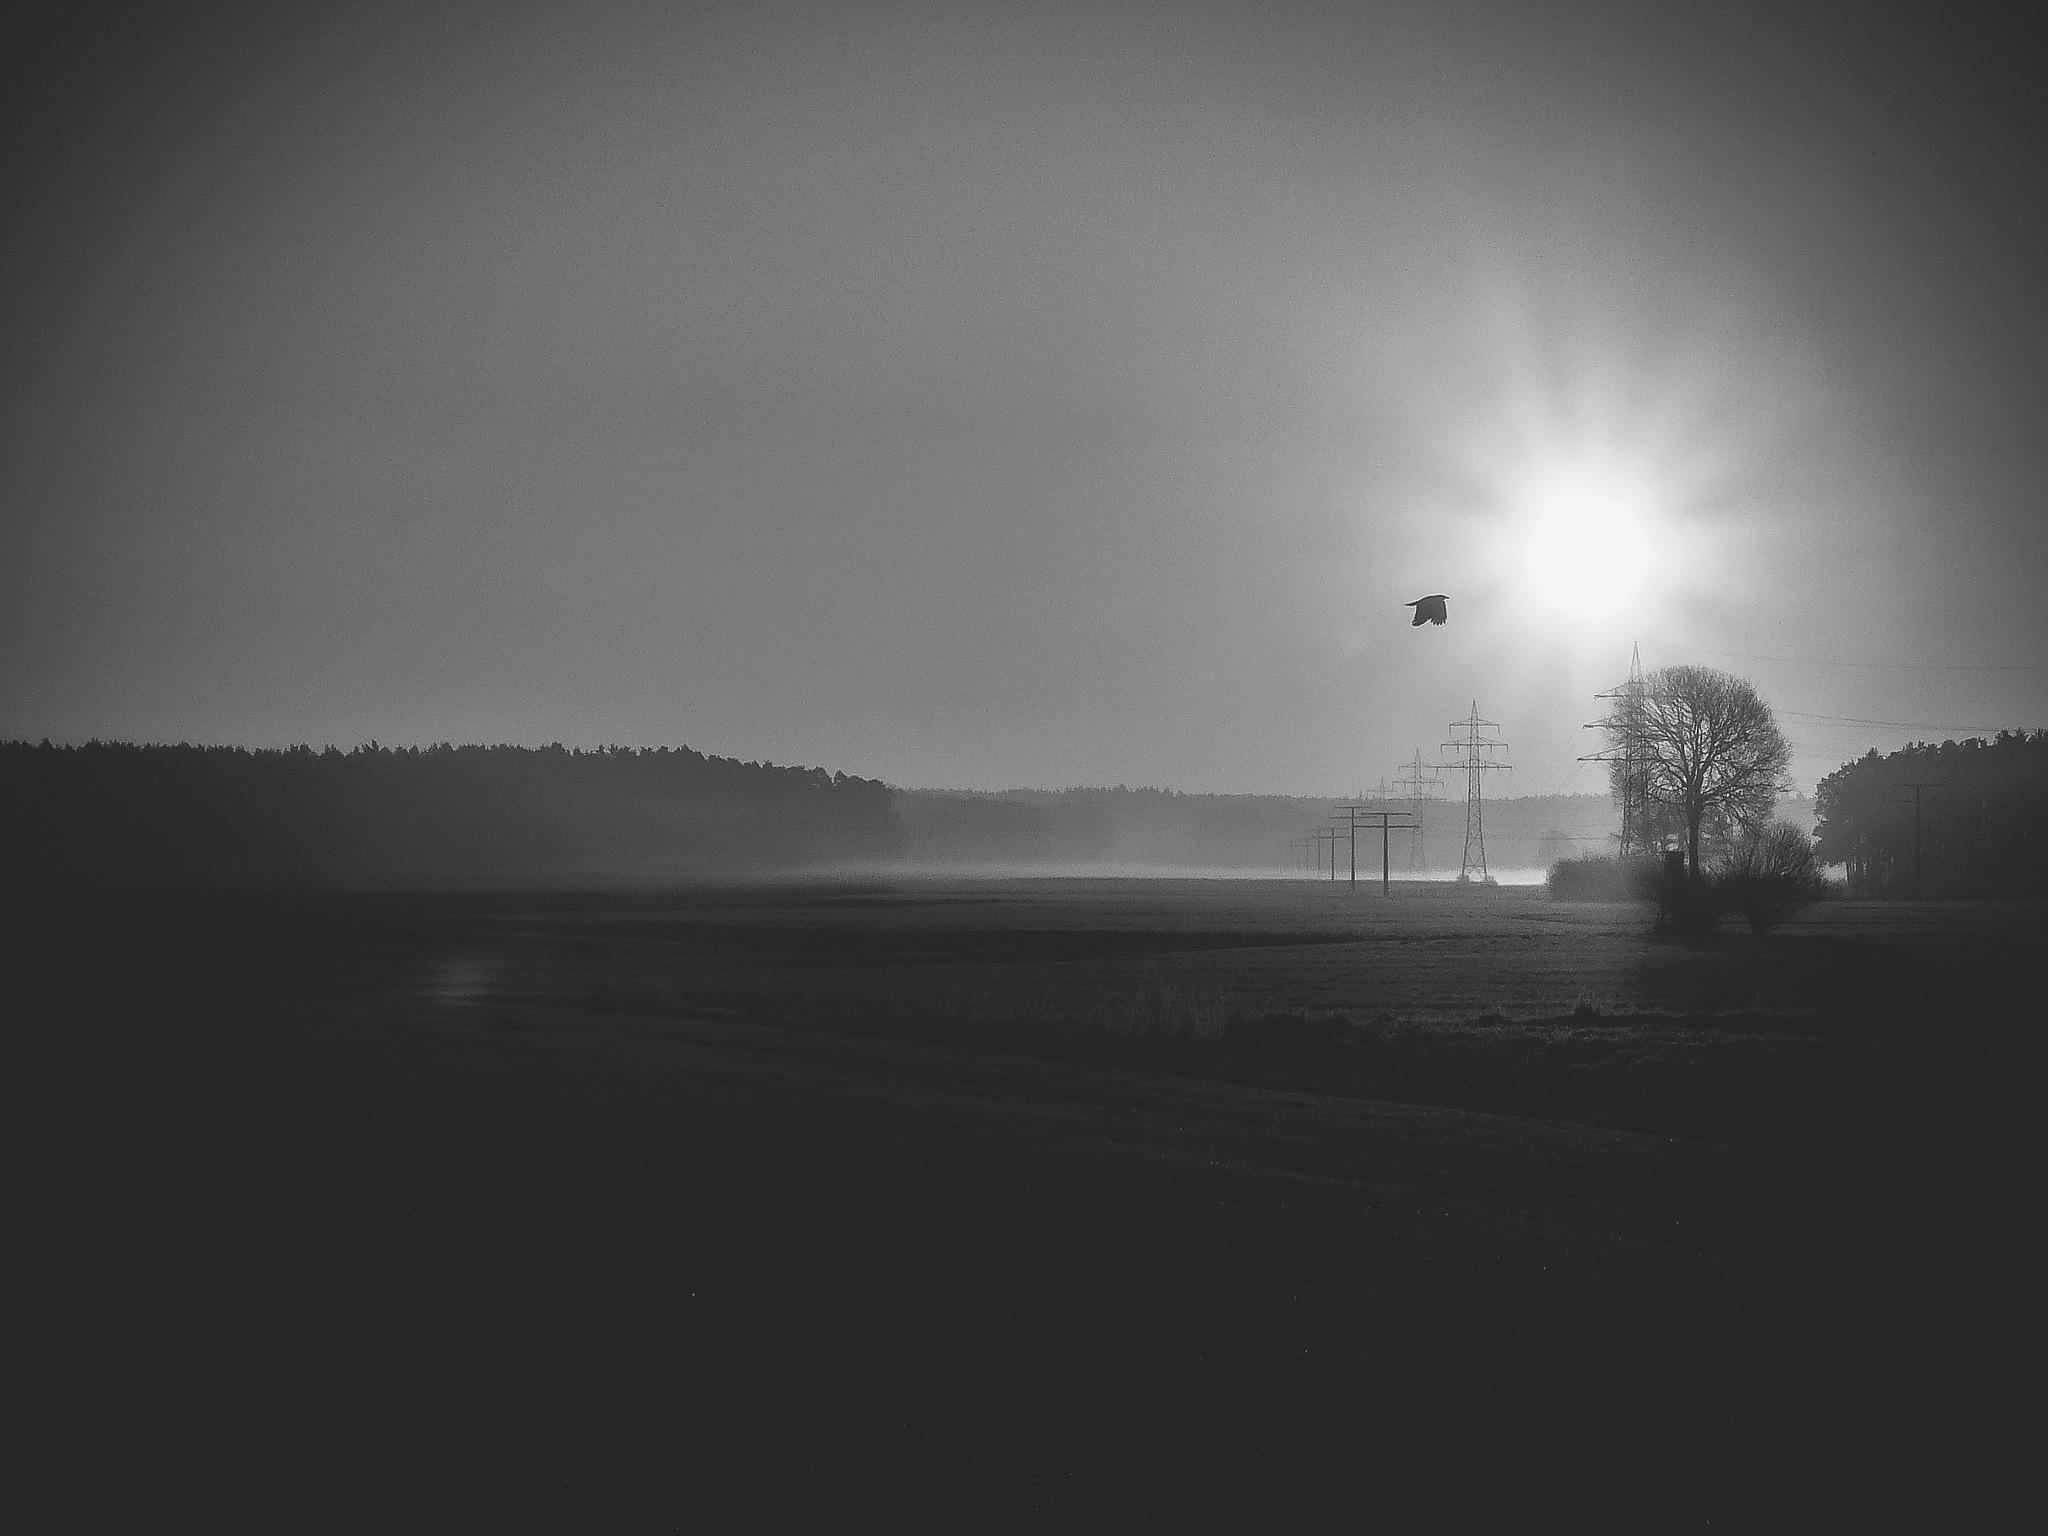 Morning by Michael Geller